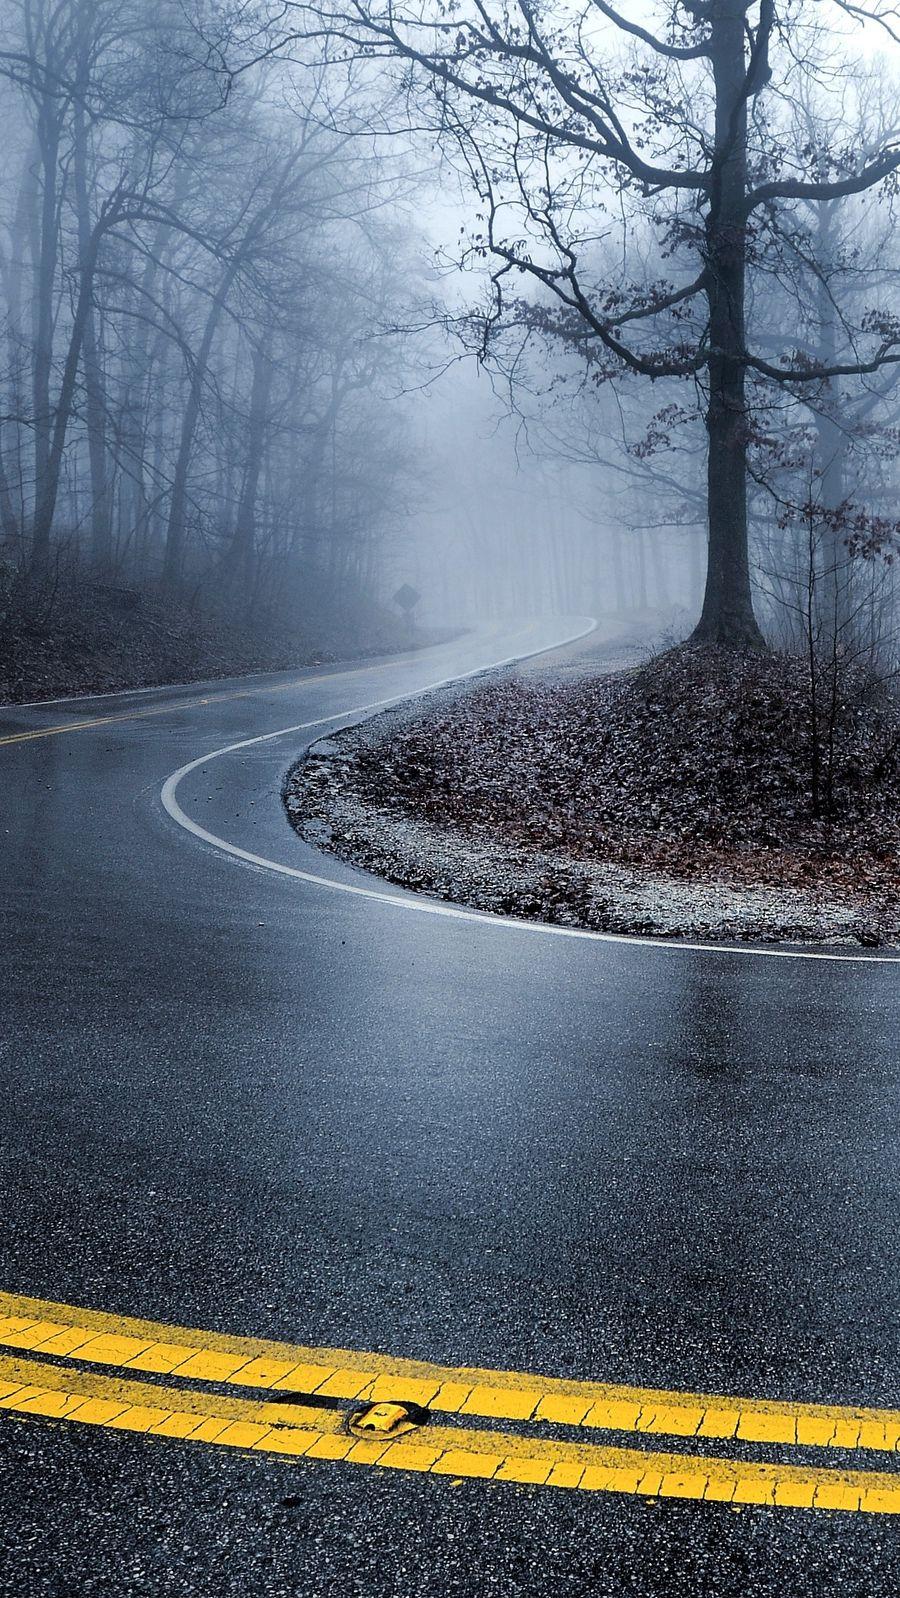 Wallpaper iphone winter - Road Winter Trees Fog Iphone Wallpaper